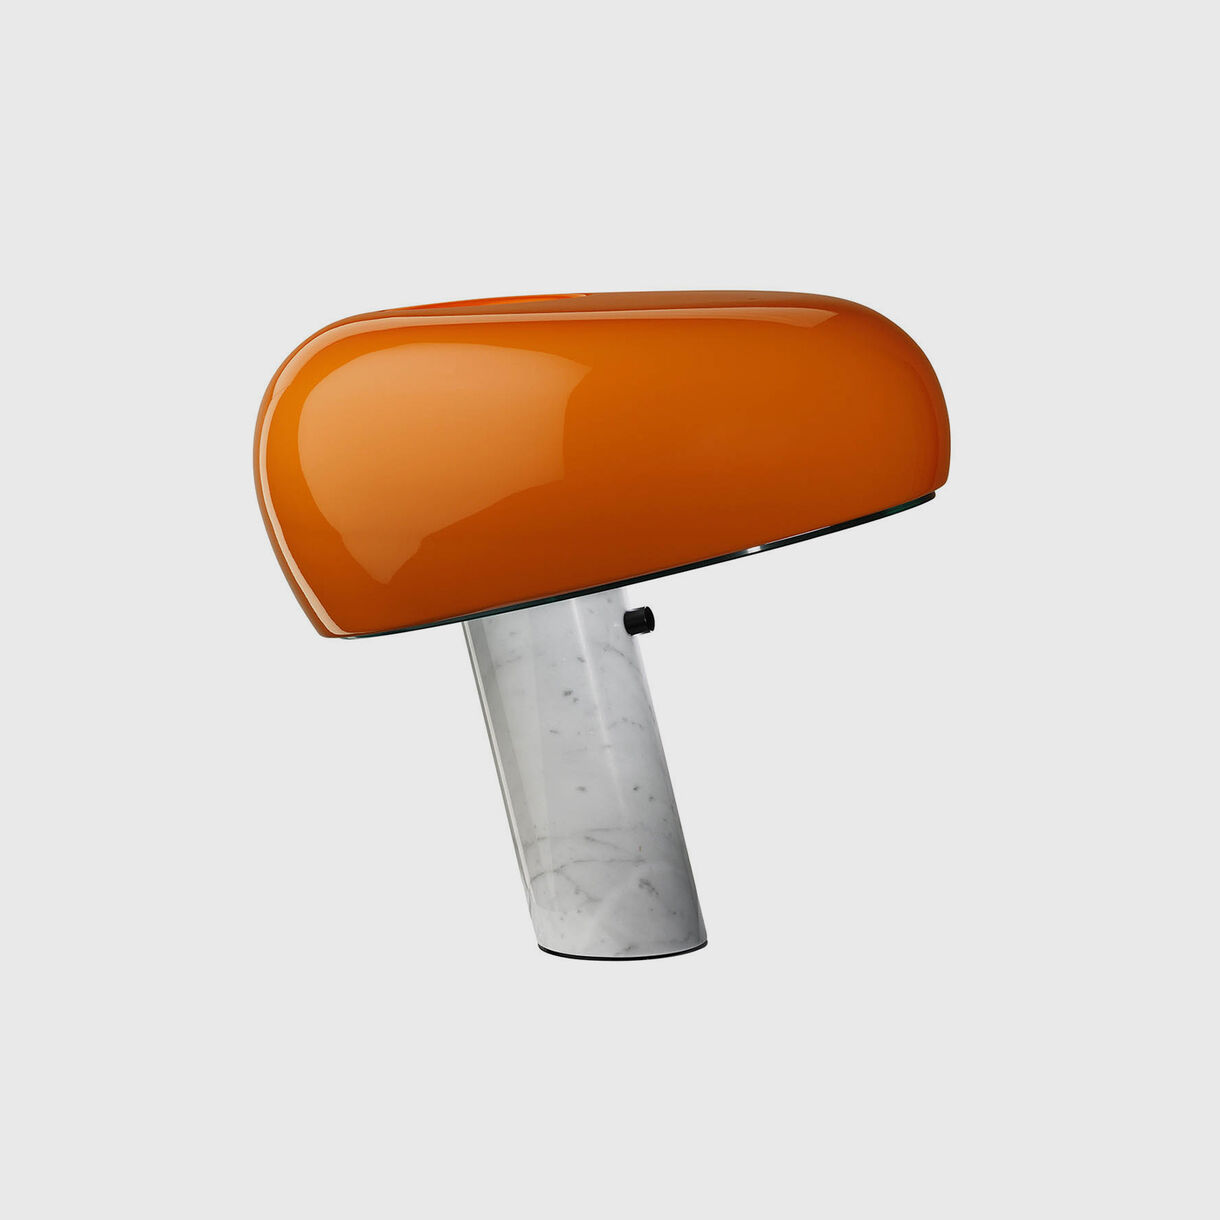 Snoopy Table Lamp, Orange